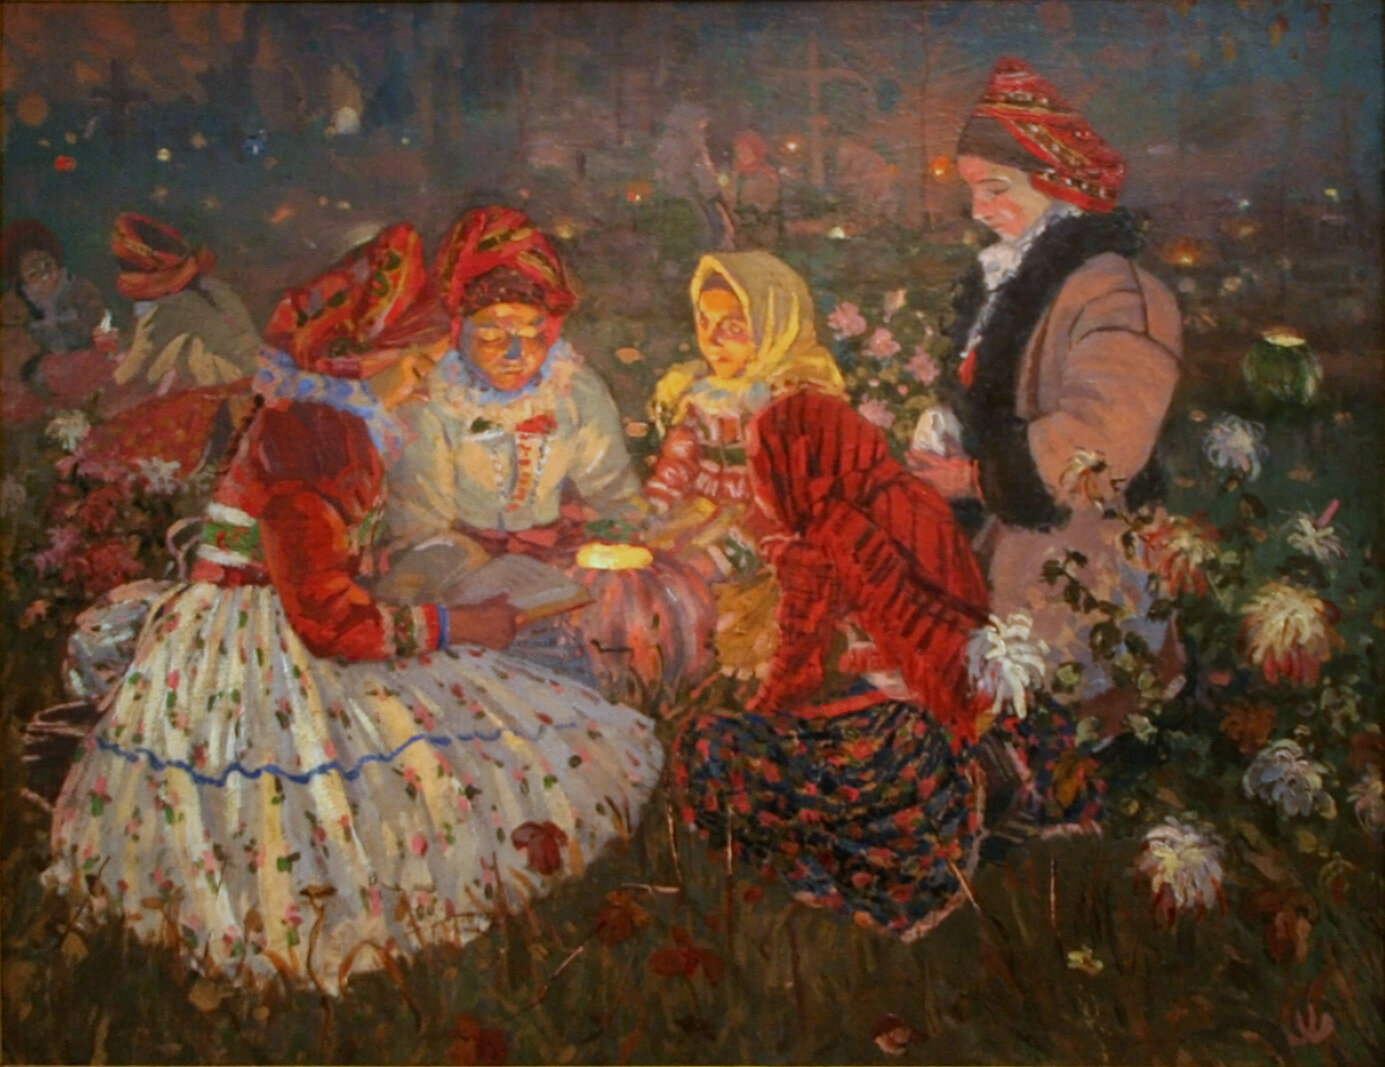 Joža Uprka    All Souls' Day,1897   Oil on Canvas  Height: 31.2 inches. Width: 40.1 inches  Národní galerie v Praze, National Gallery in Prague  Prague, Czech Republic